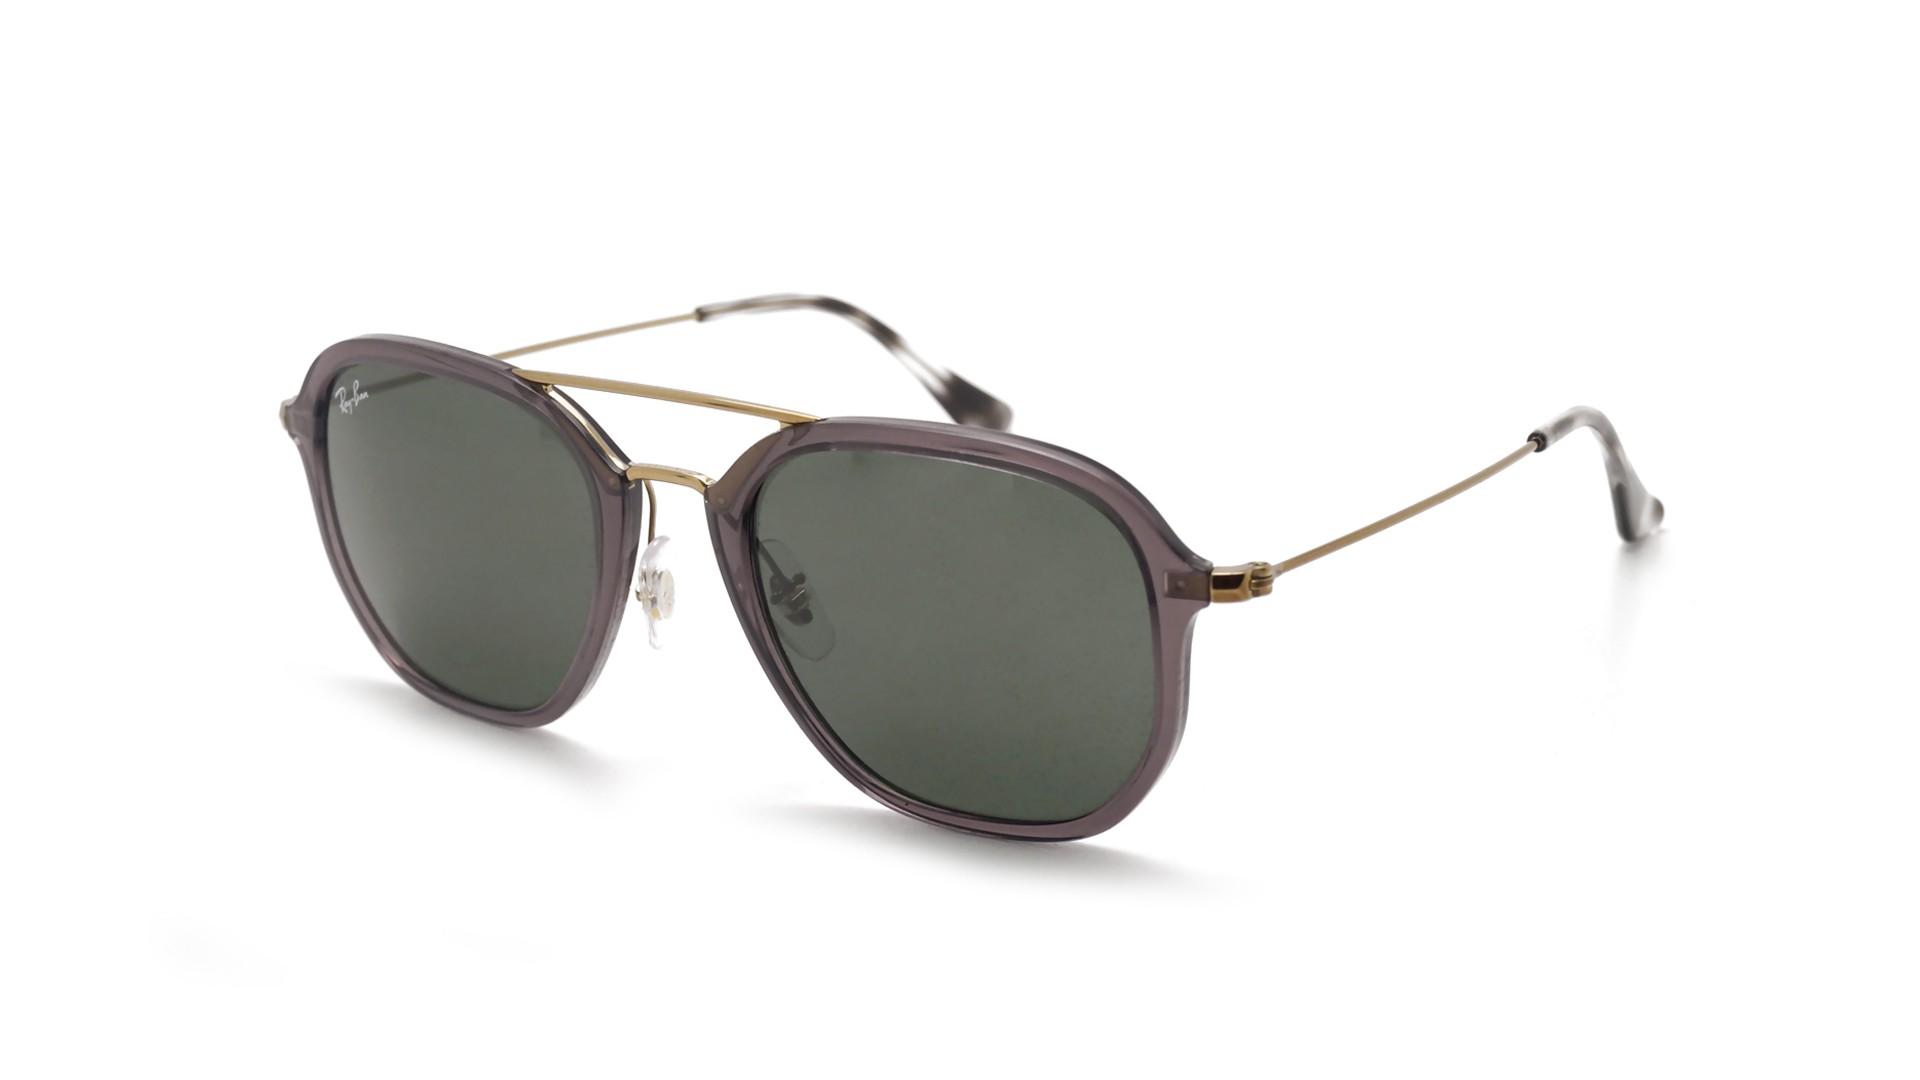 46ed44ee51 Sunglasses Ray-Ban RB4273 6237 52-21 Grey G-15 Medium